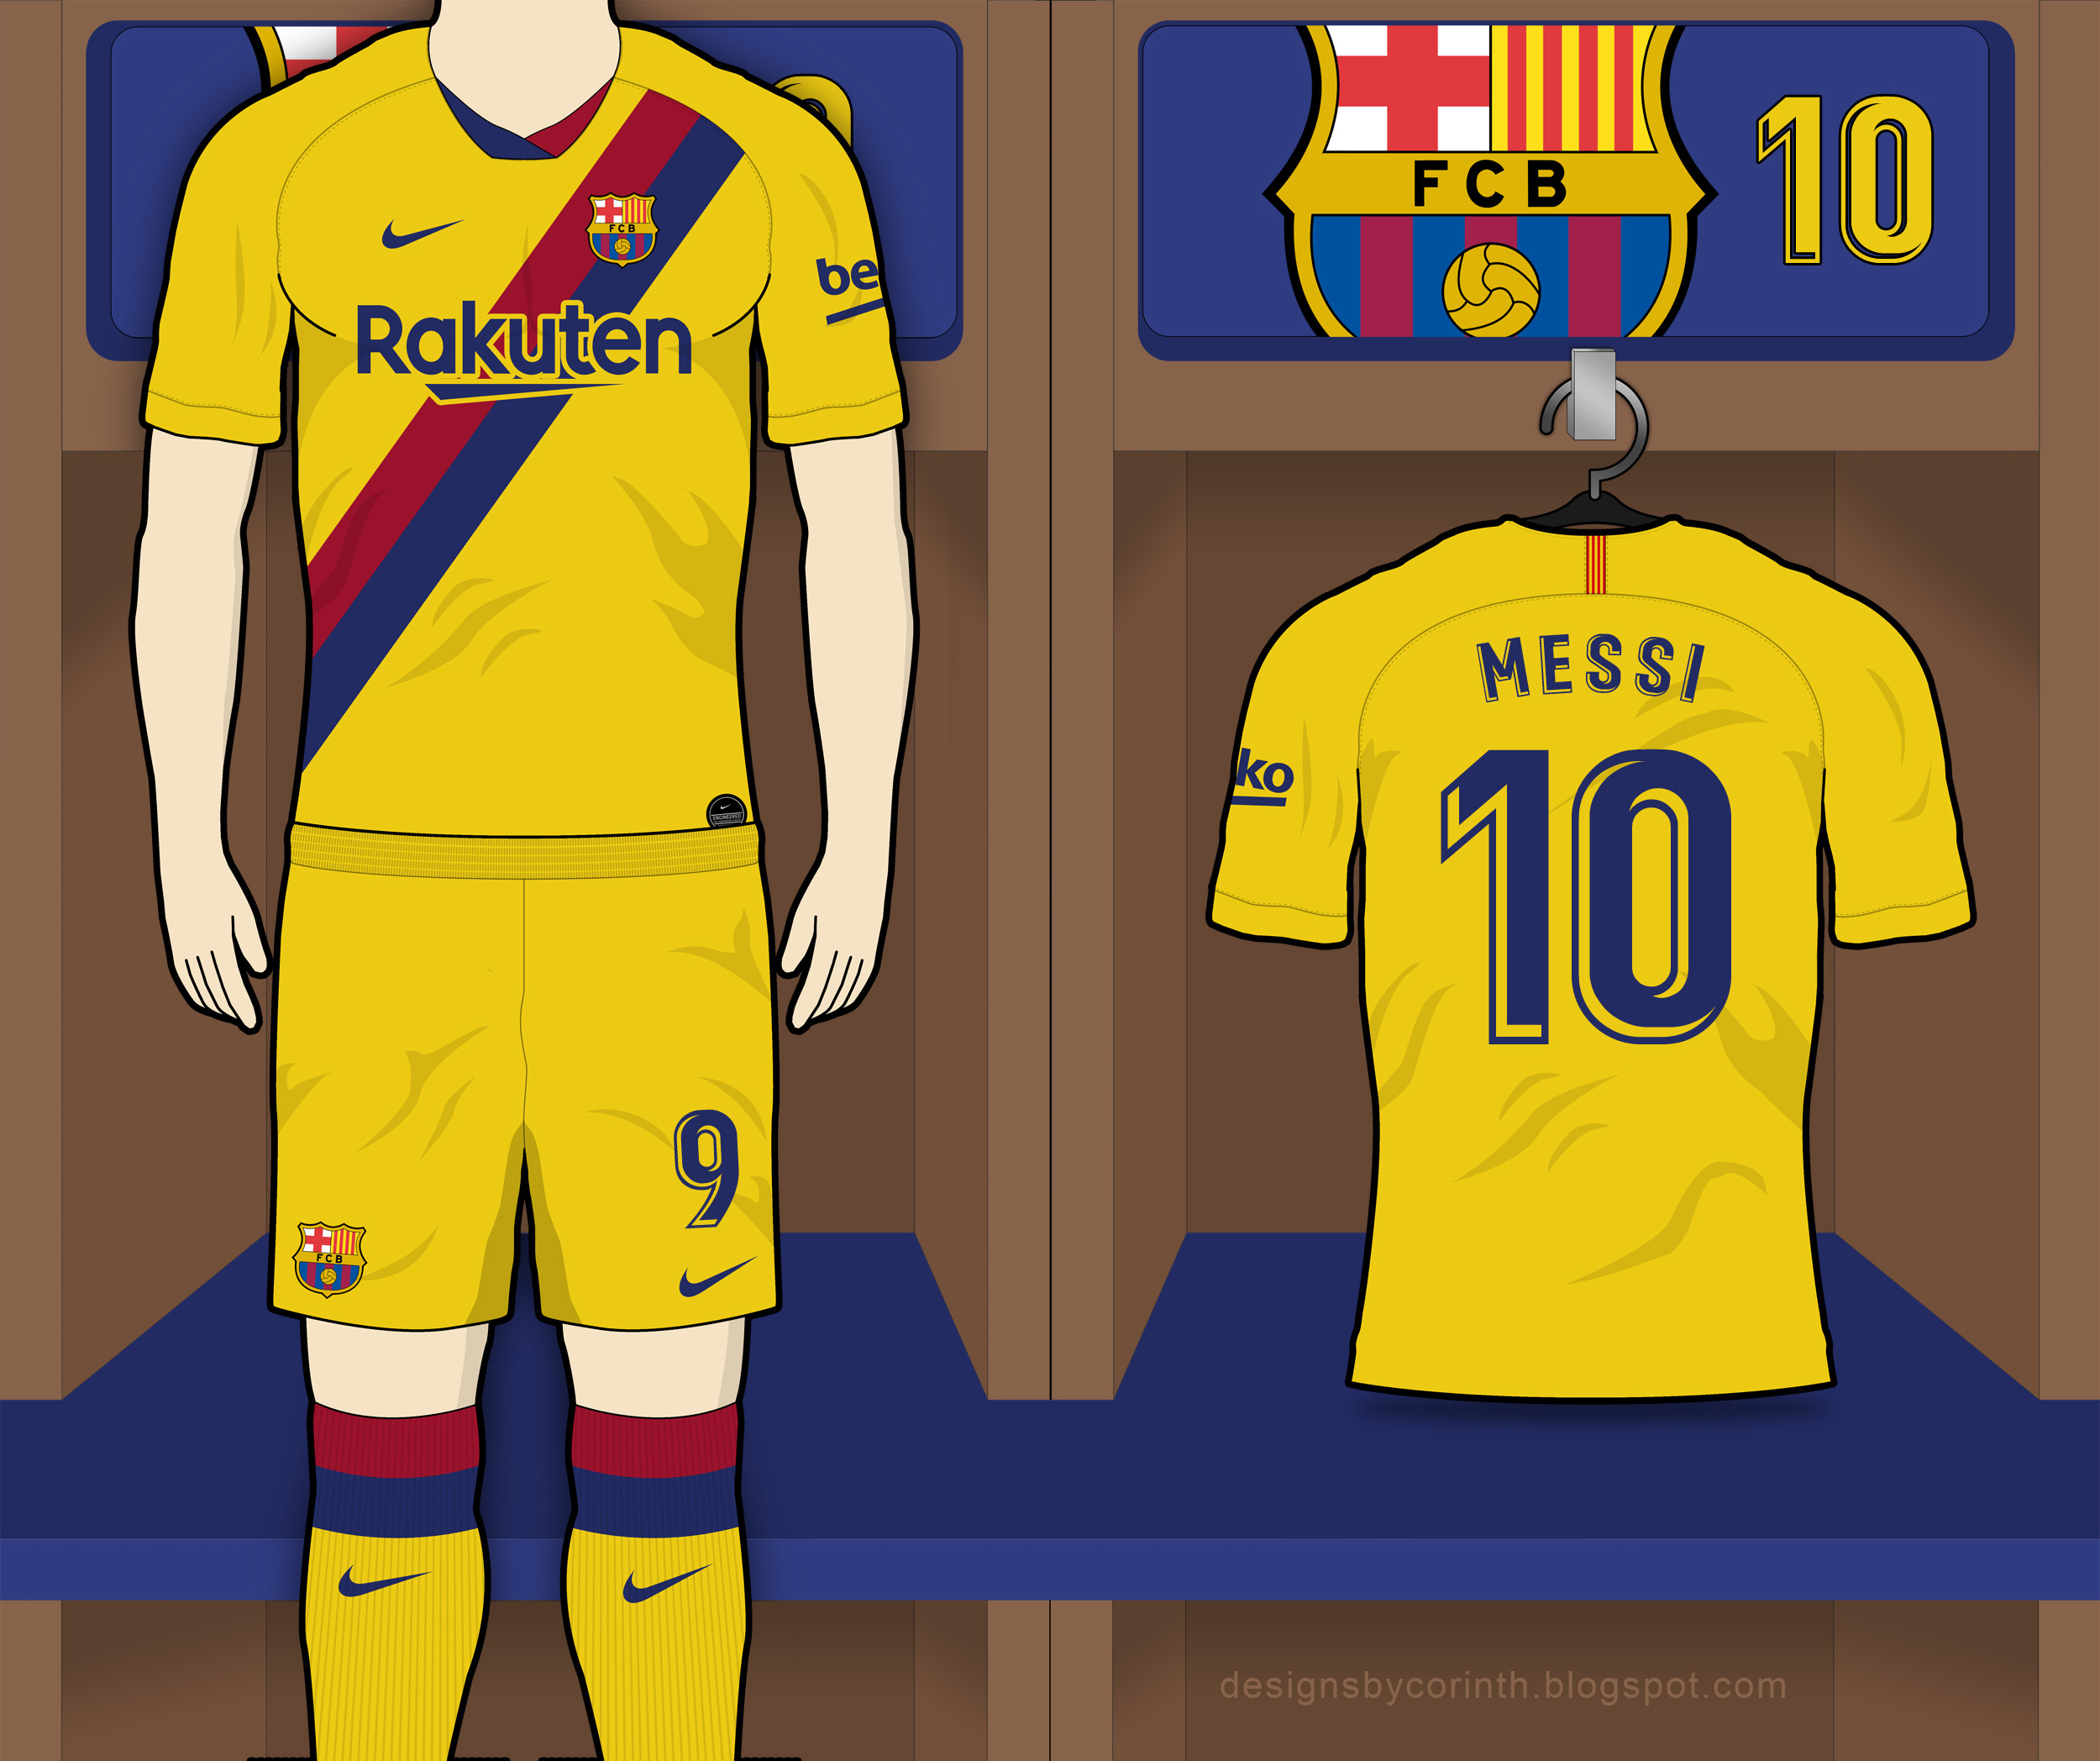 9595ea18770 Click to enlarge image barcelona 19 20 away kit prediction a.jpg ...